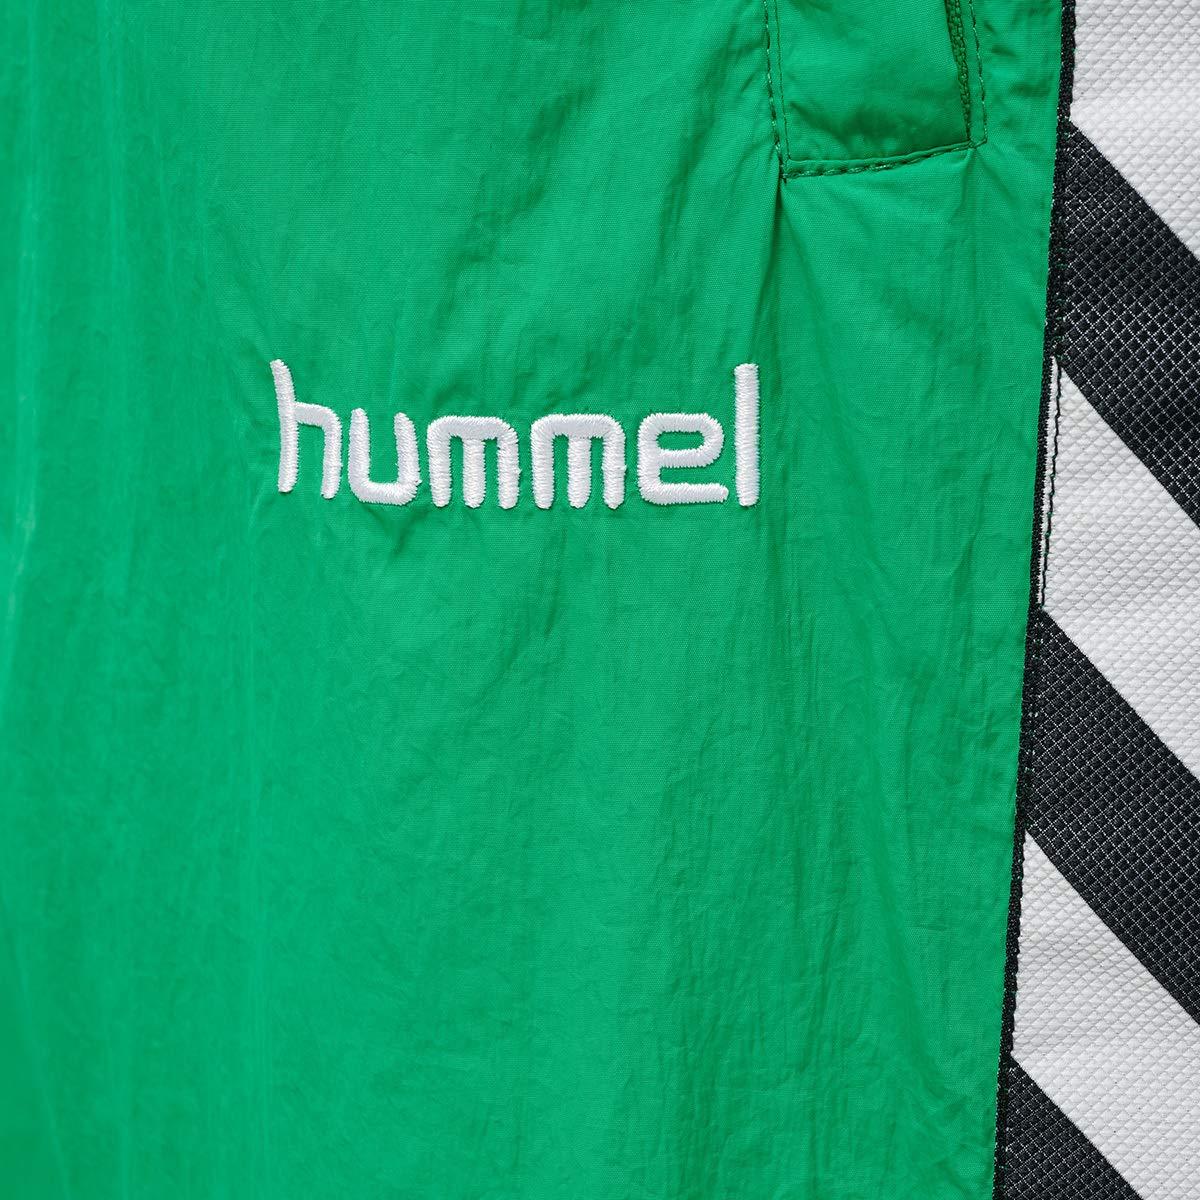 hummel Christian Pantalones, Hombre: Amazon.es: Deportes y aire libre